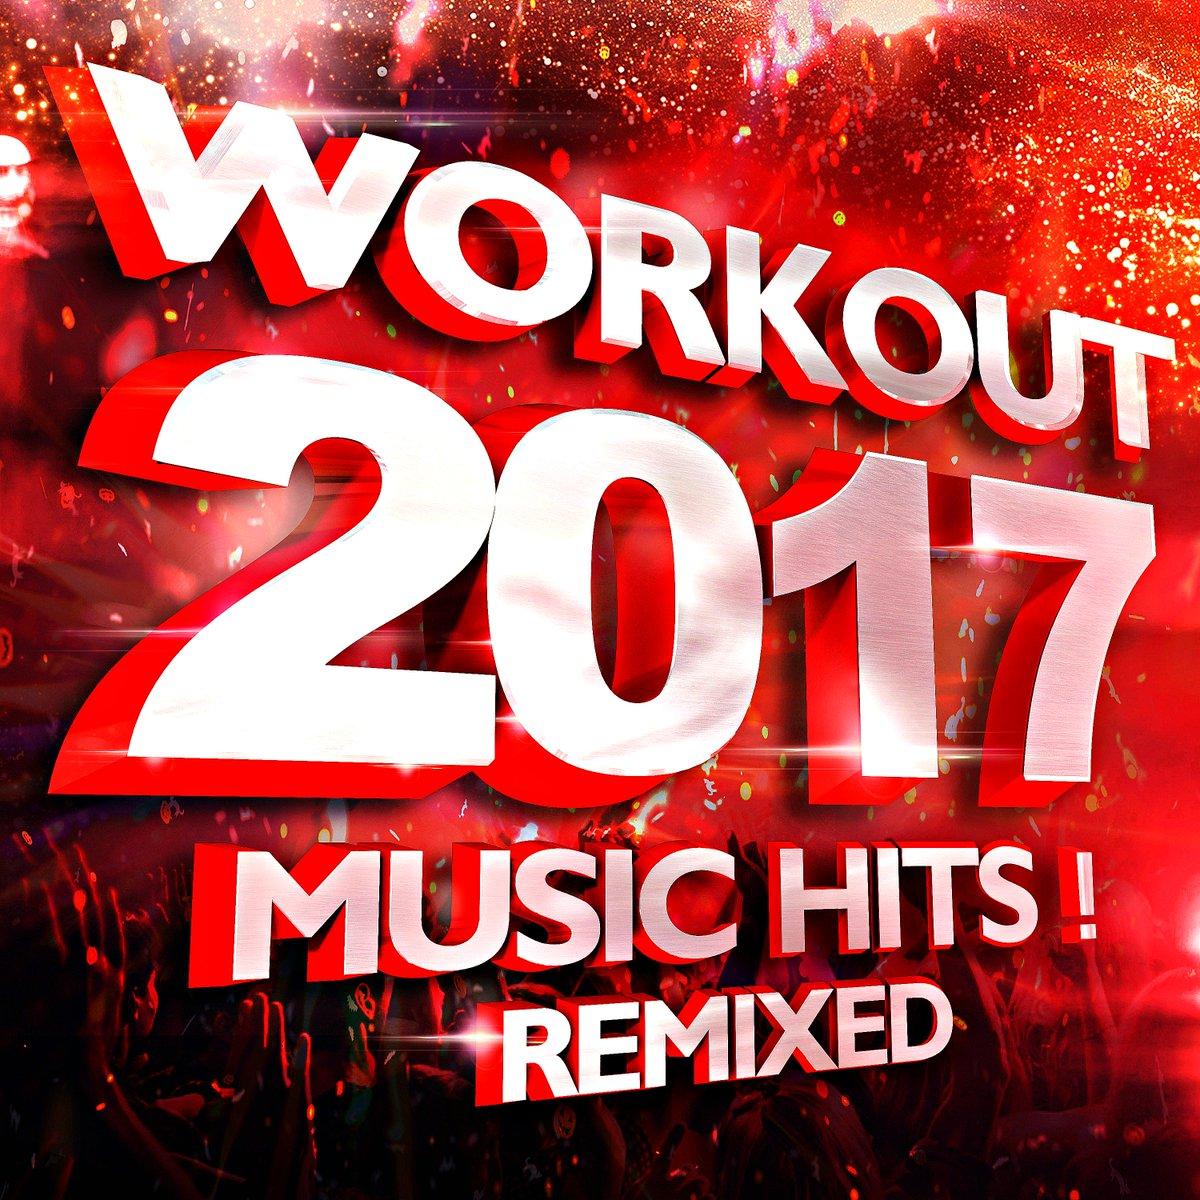 Workout 2017 Music Hits! Remixed Avail @ ITUNES under Workout Remix Factory #SPOTIFY #deezer #WorkoutRemixFactory #WorkoutRemix #WorkoutBuddy #fitness #workout #running #WorkOutMusic #Weightloss #Gym #treadmill #exercise #personaltrainer #spinninginstructor #fitnessinstructor<br>http://pic.twitter.com/aKYDbjcLdq